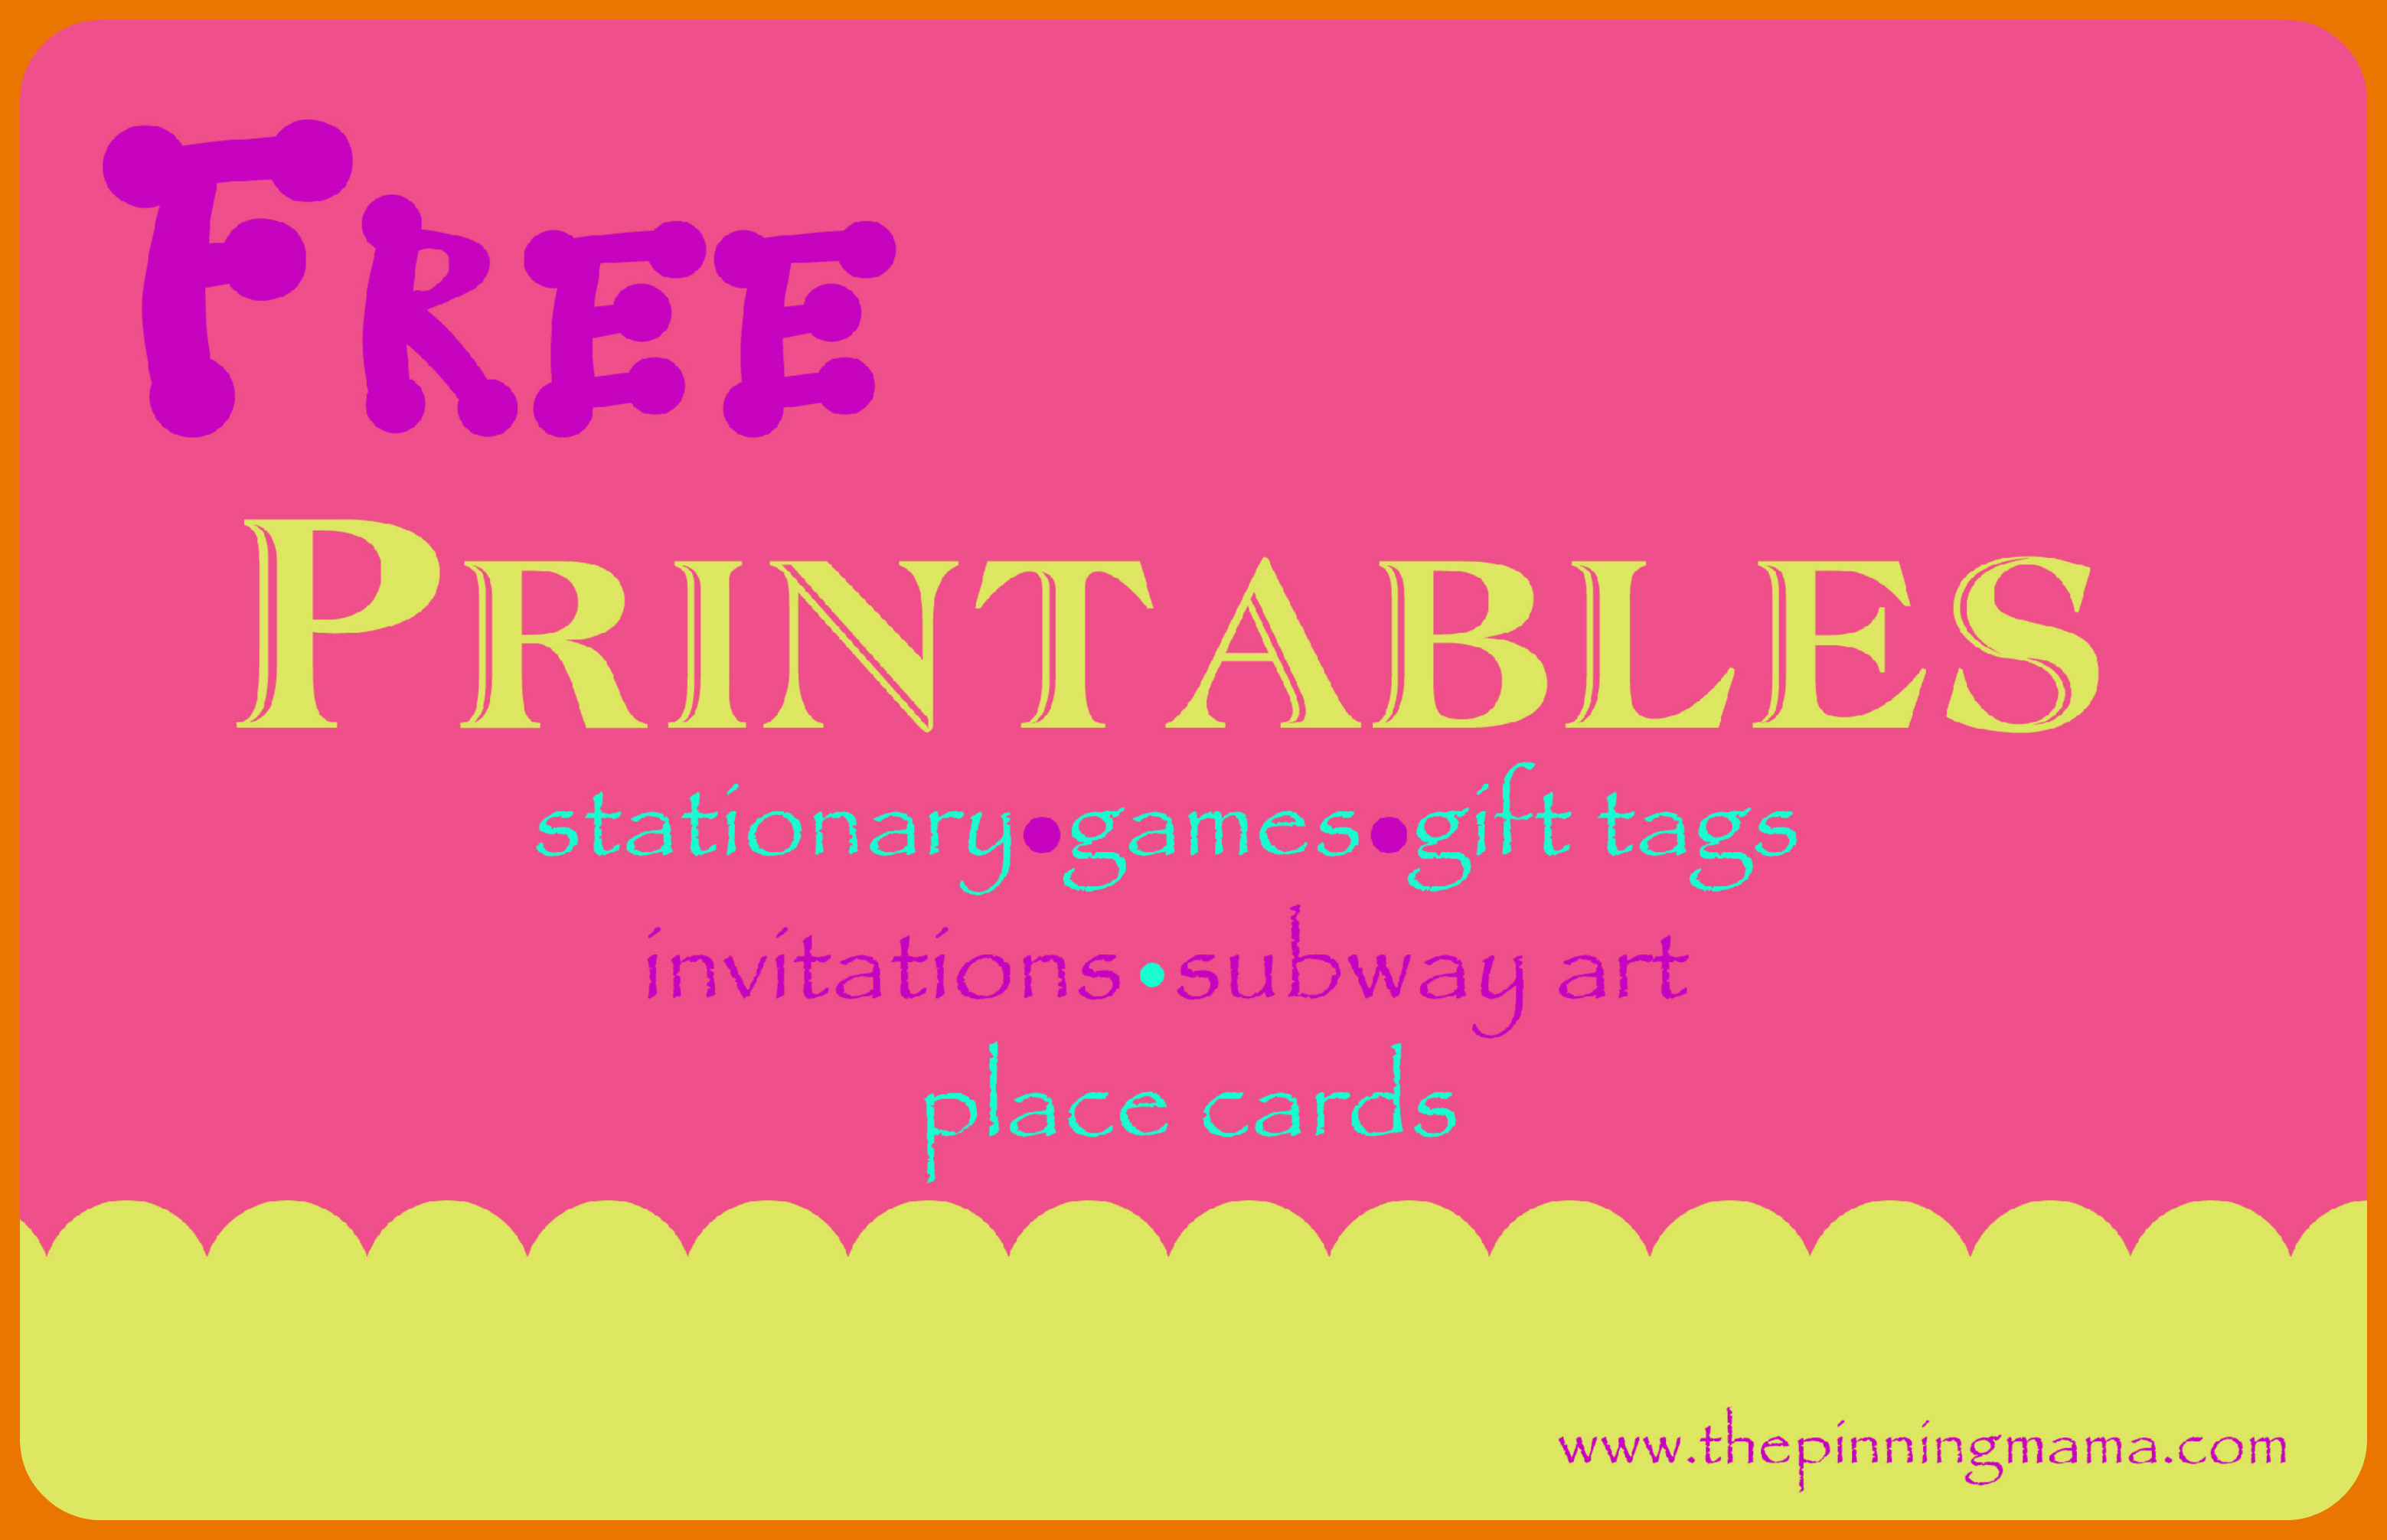 Baby Shower Invitations Templates Printable Cards Online Card Black - Baby Shower Cards Online Free Printable